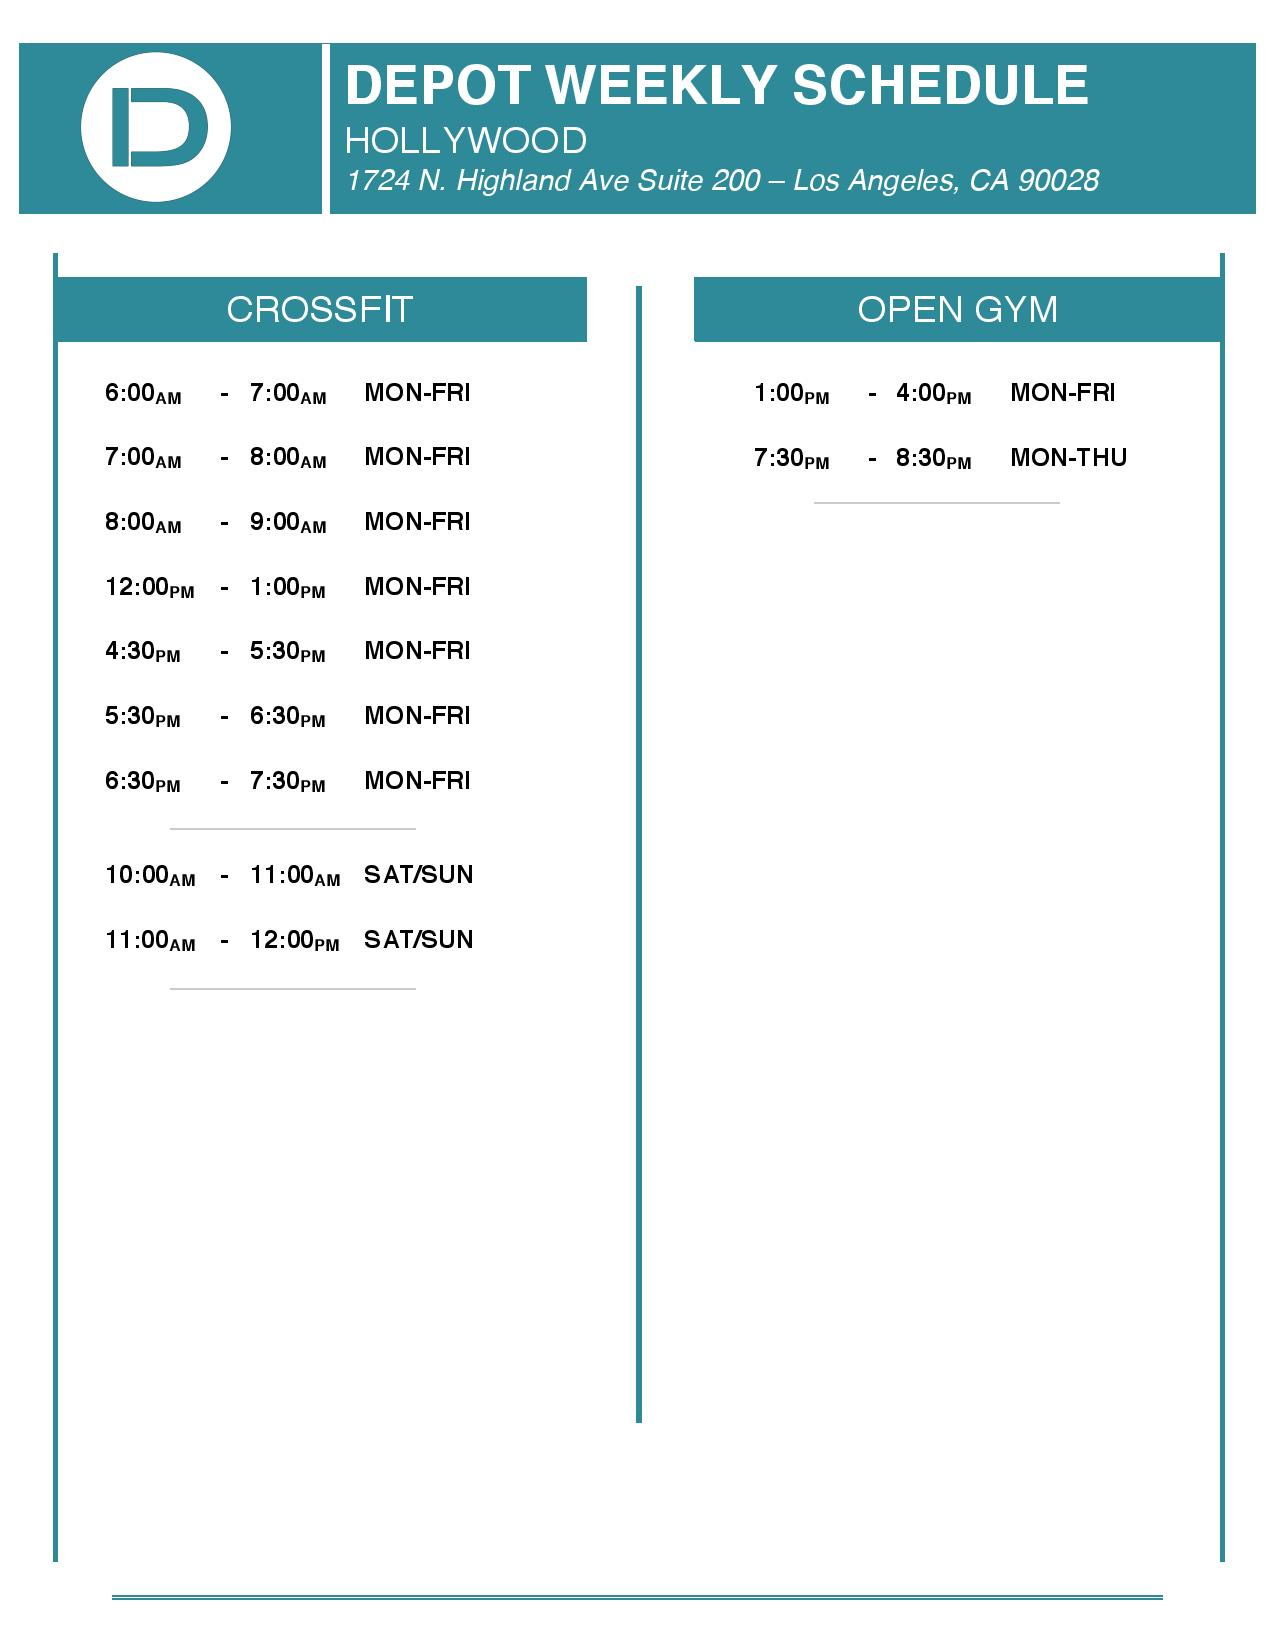 Depot Schedule - Hollywood.jpg